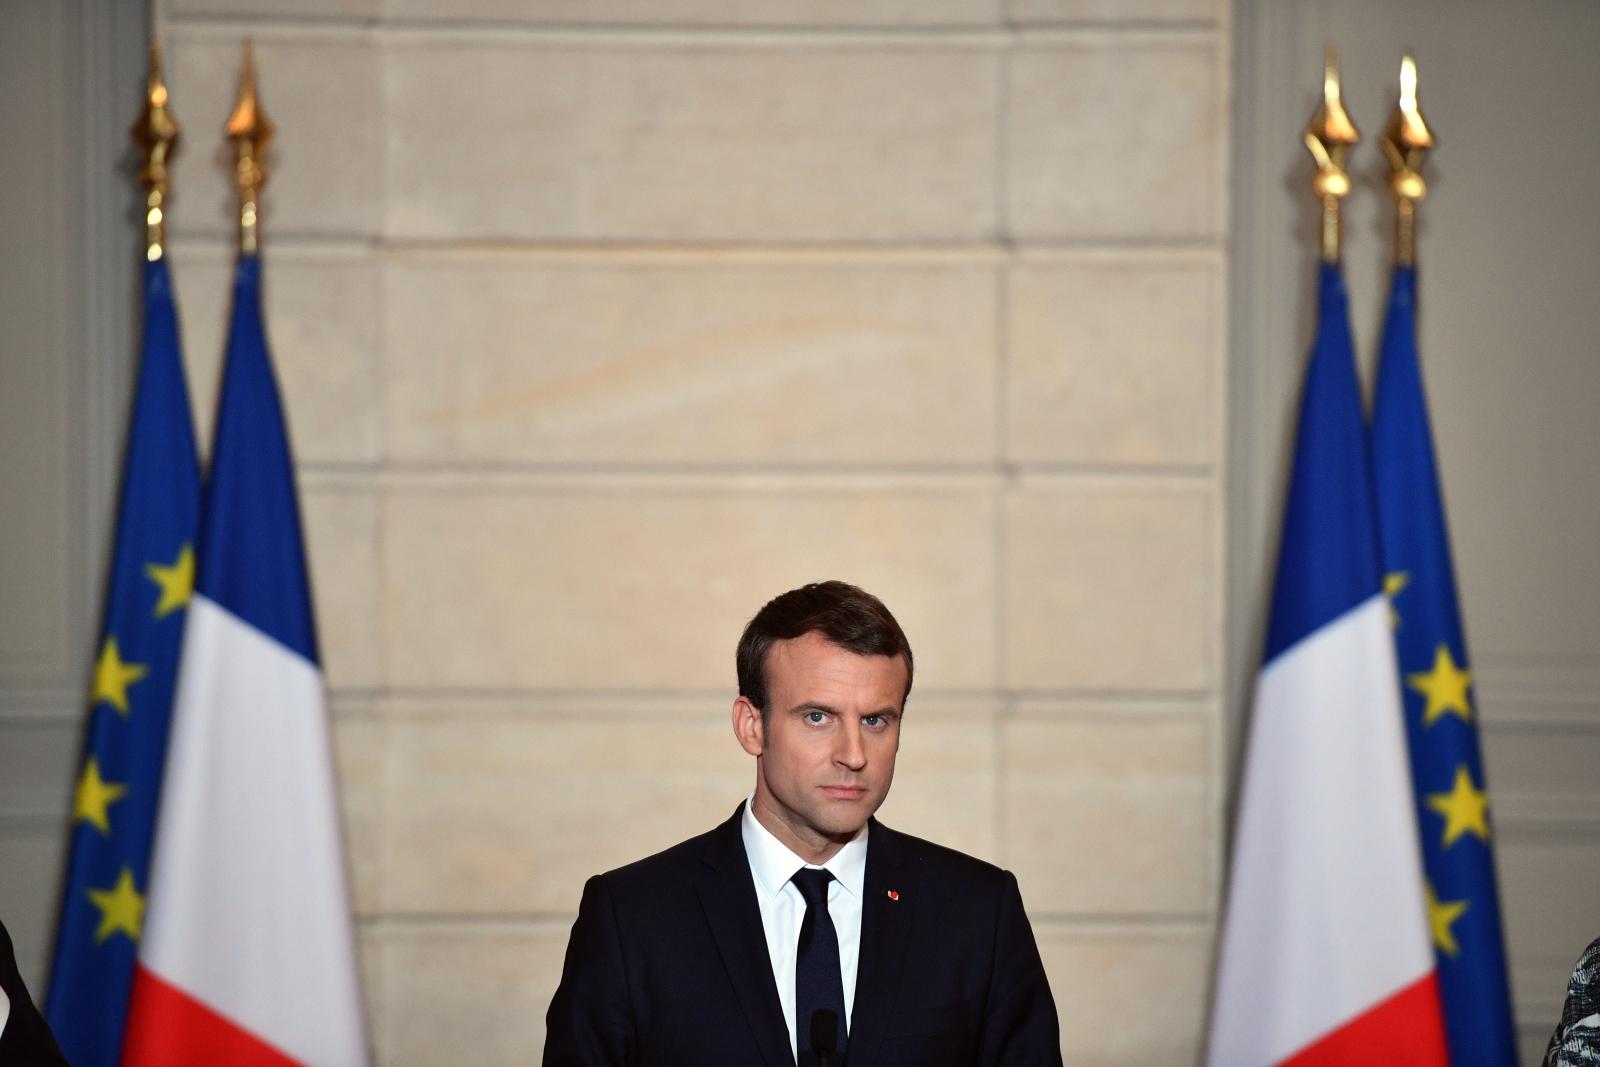 Prezydent Emmanuel Macron. fot. EPA/CHRISTOPHE PETIT TESSON